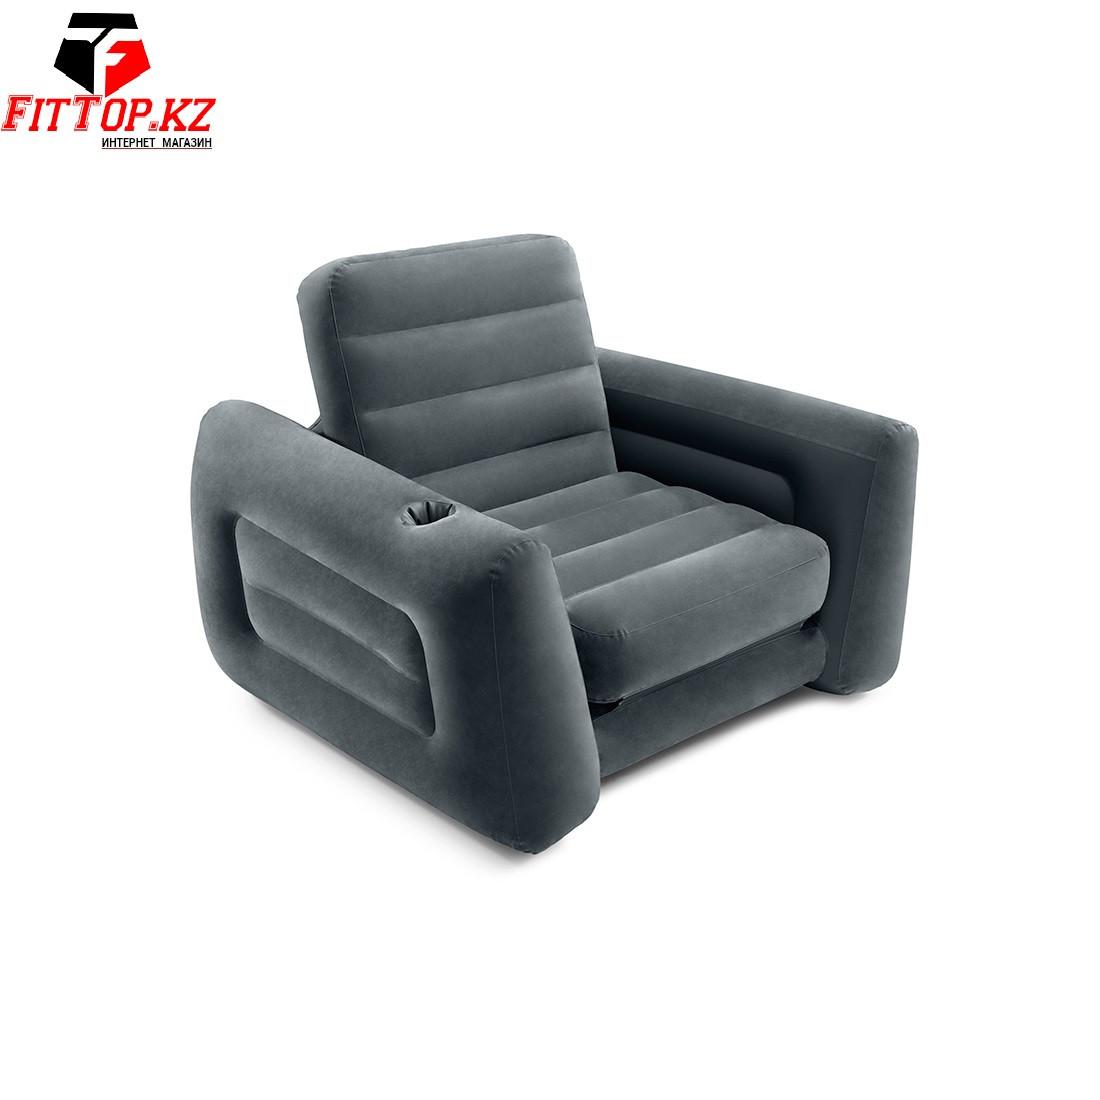 Кресло-трансформер надувное Pull-Out Chair (224x117x66 см) INTEX 66551NP